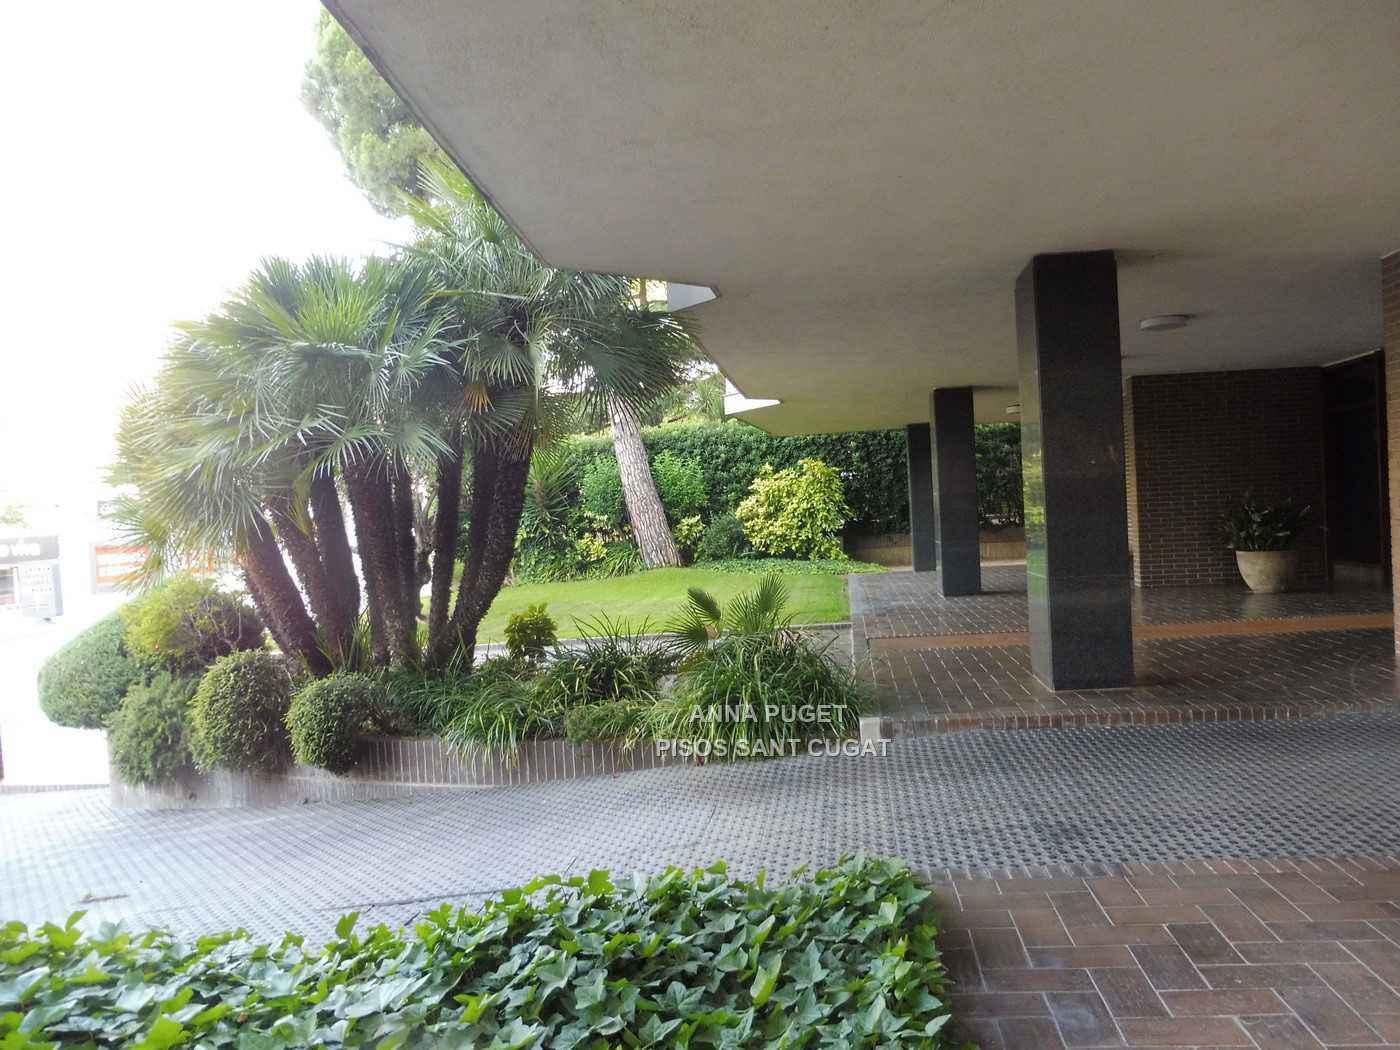 Sant Cugat-Centro Atico Duplex-1